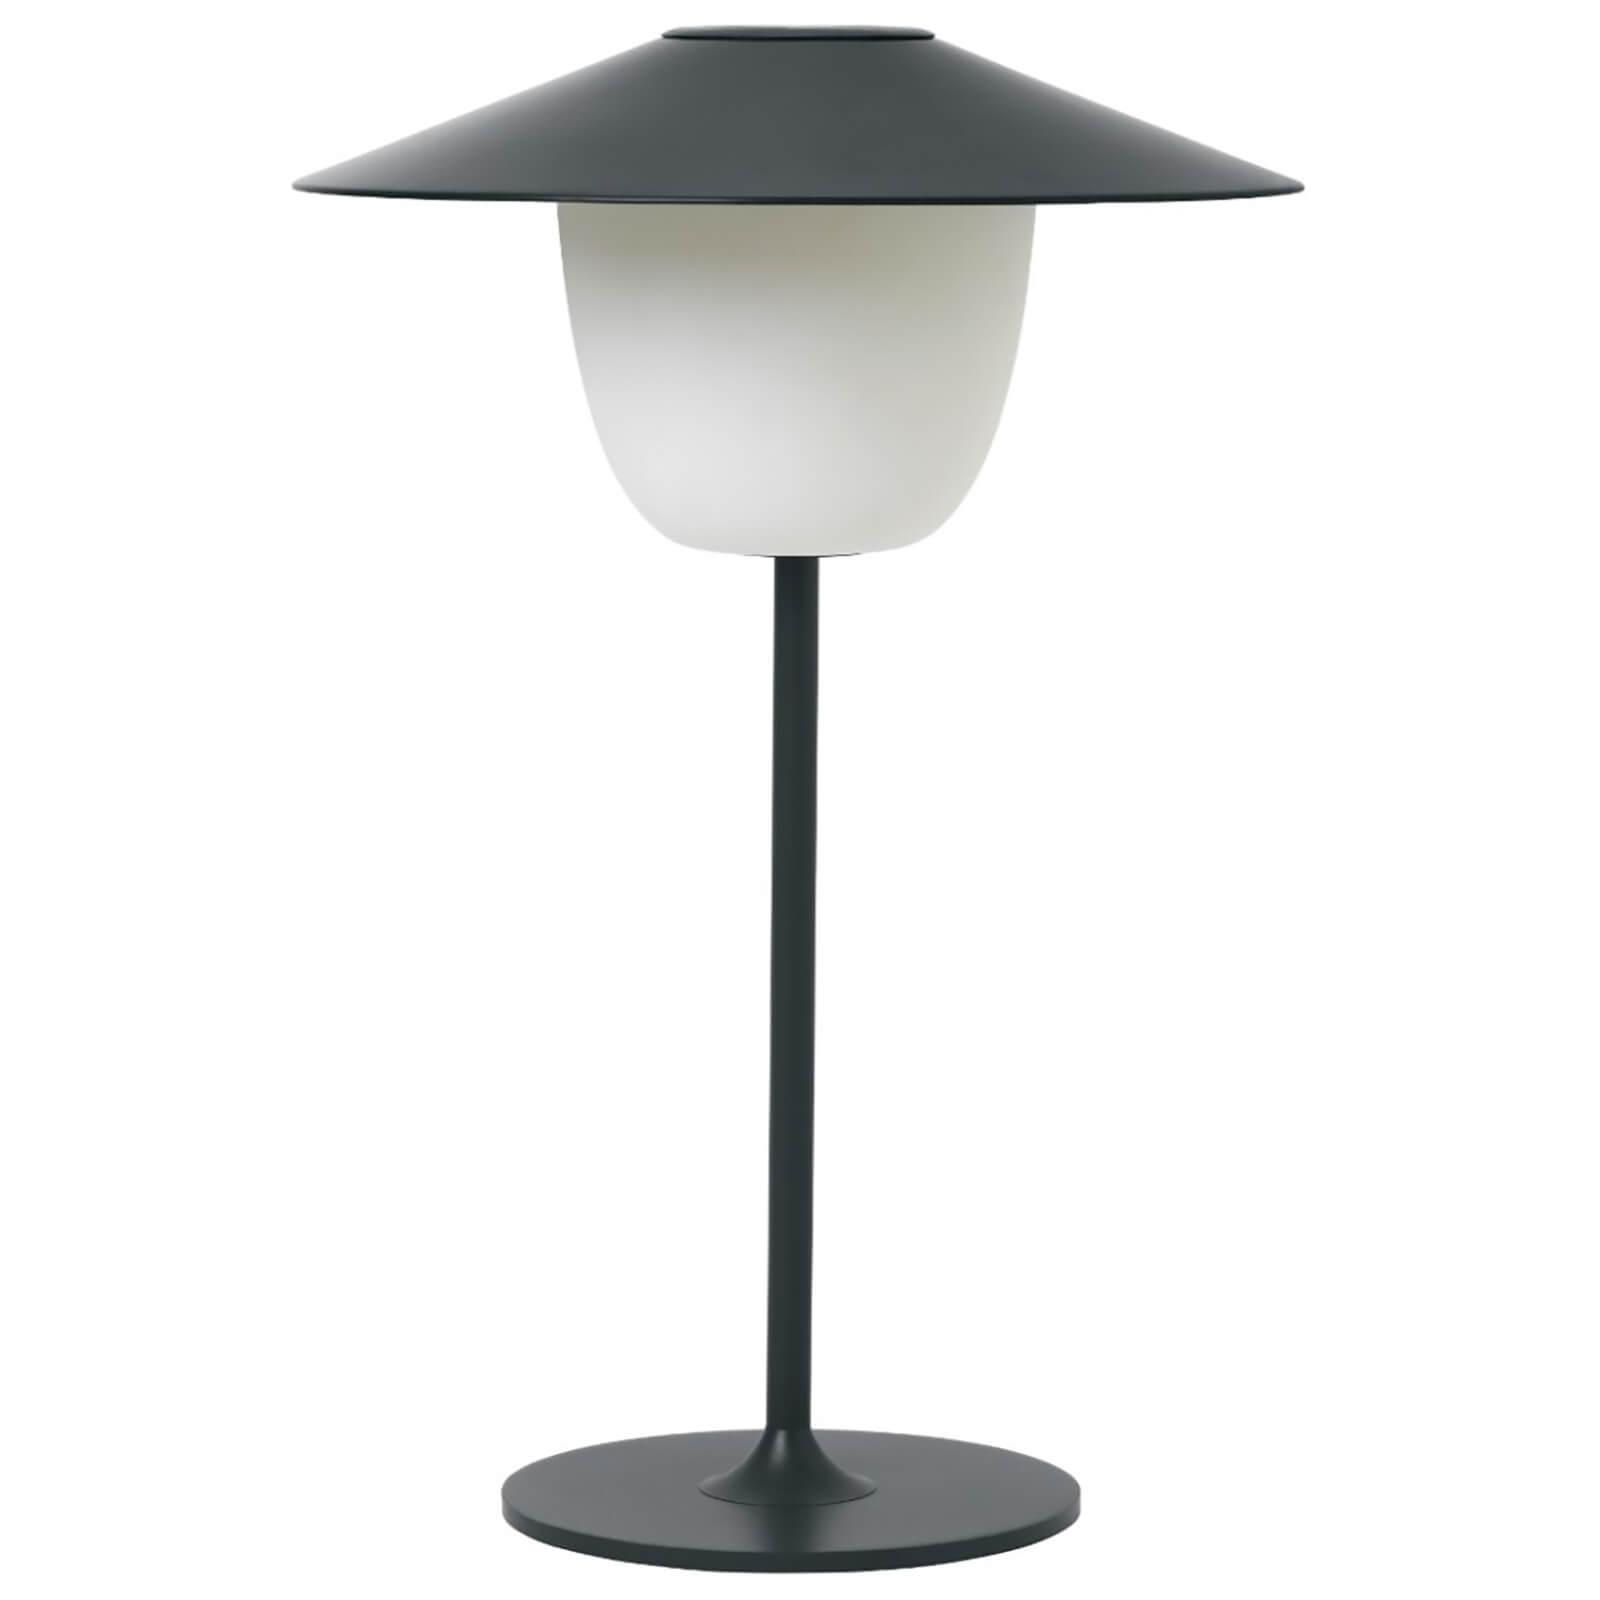 Blomus Ani Lamp Mobile LED - Lamp - Magnet